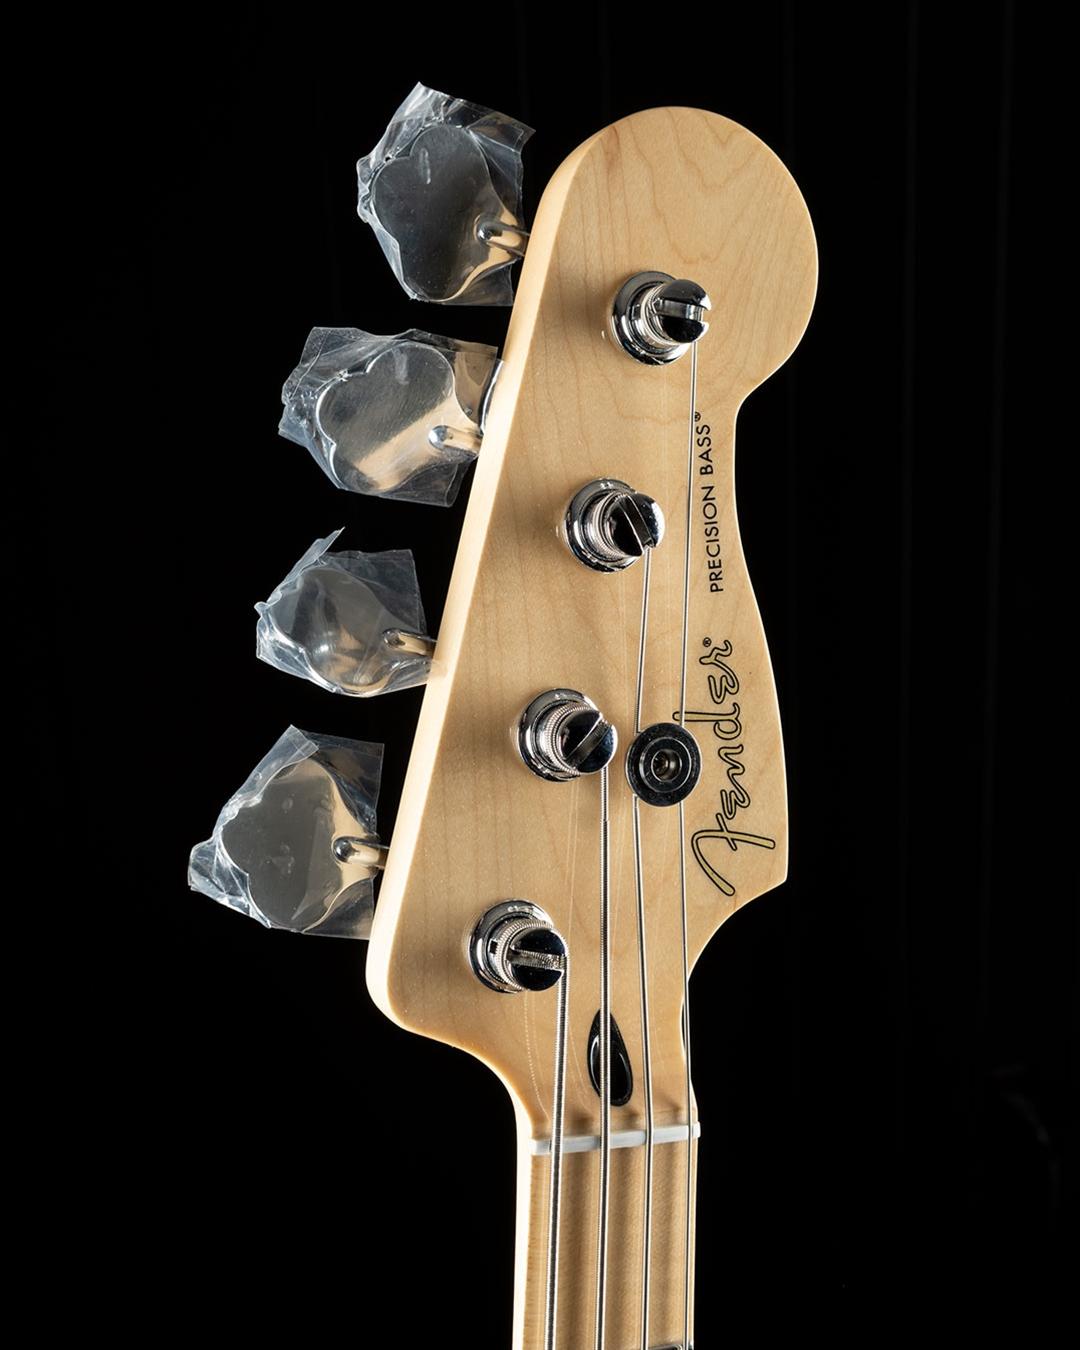 Fender Player Precision Bass Buttercream Accurate Tone Control Show Picture 8